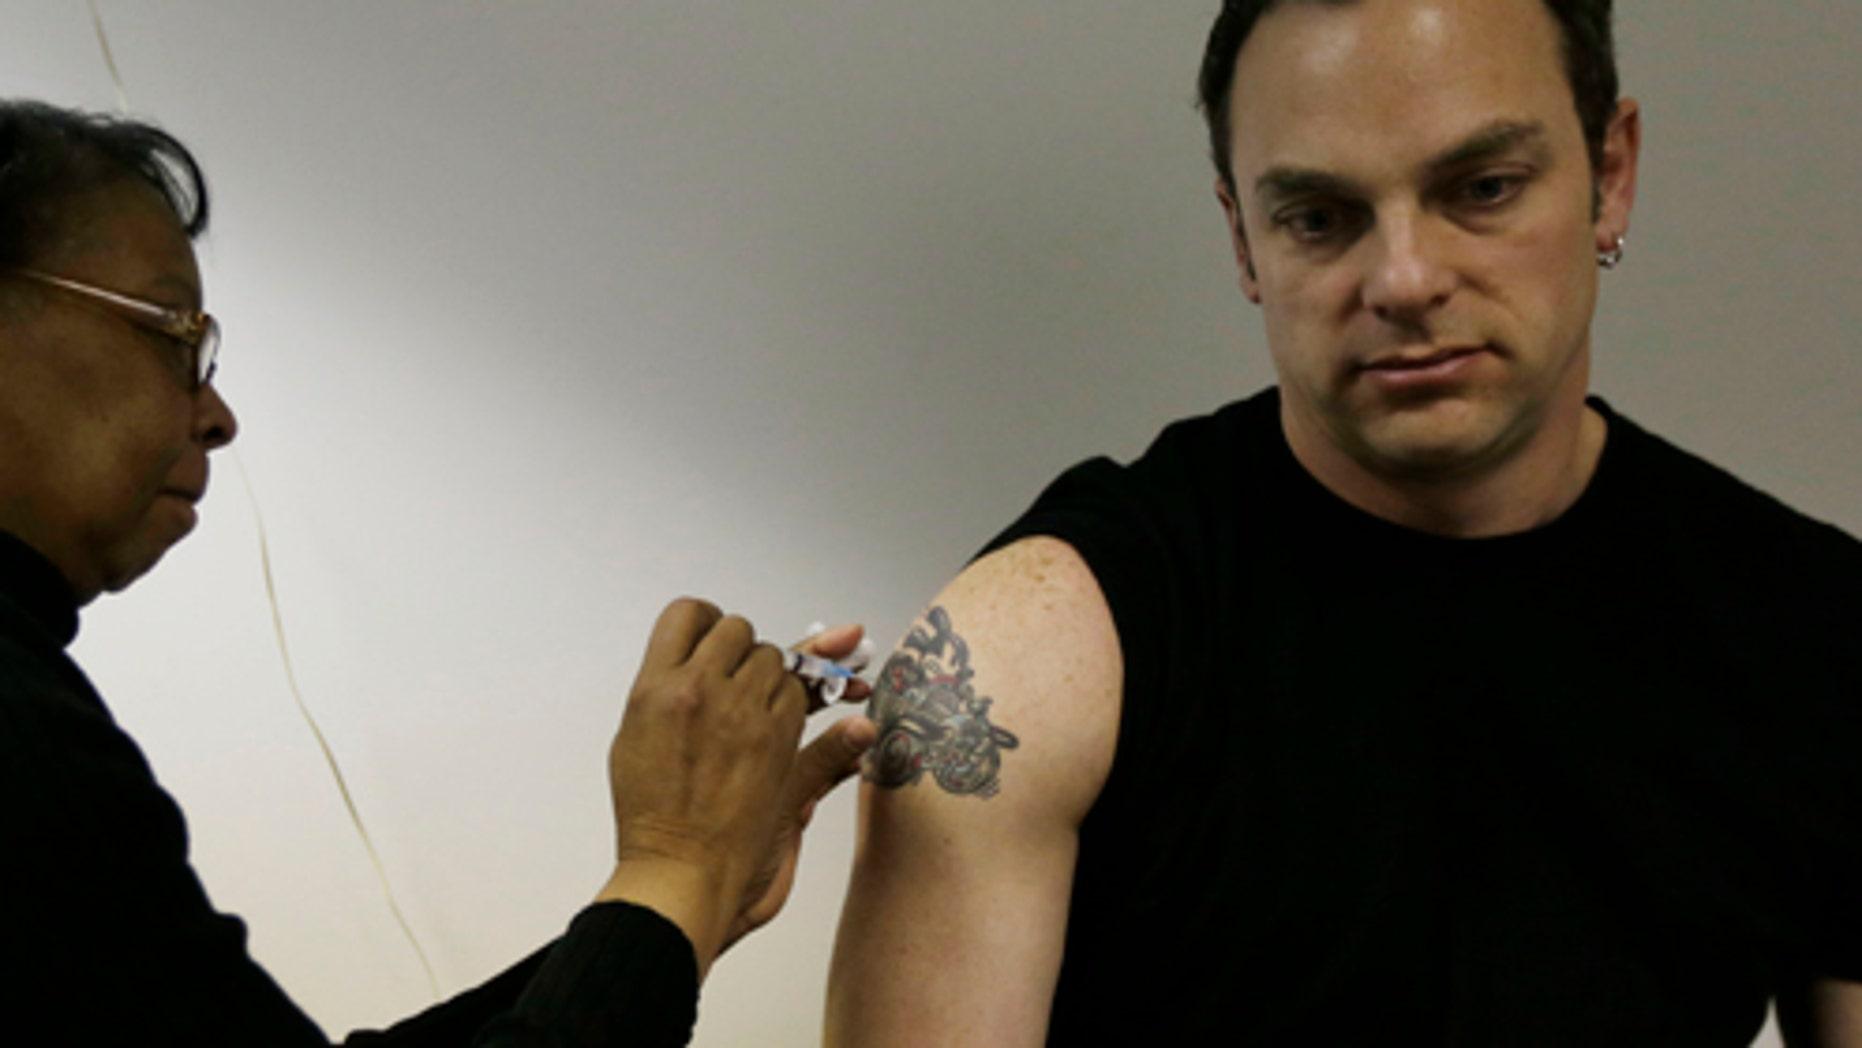 Pam Horn administers the flu vaccine to employee Michael Karolitzky at Philly Flu Shots on Thursday, Jan. 10, 2013, in Philadelphia. (AP Photo/Matt Rourke)